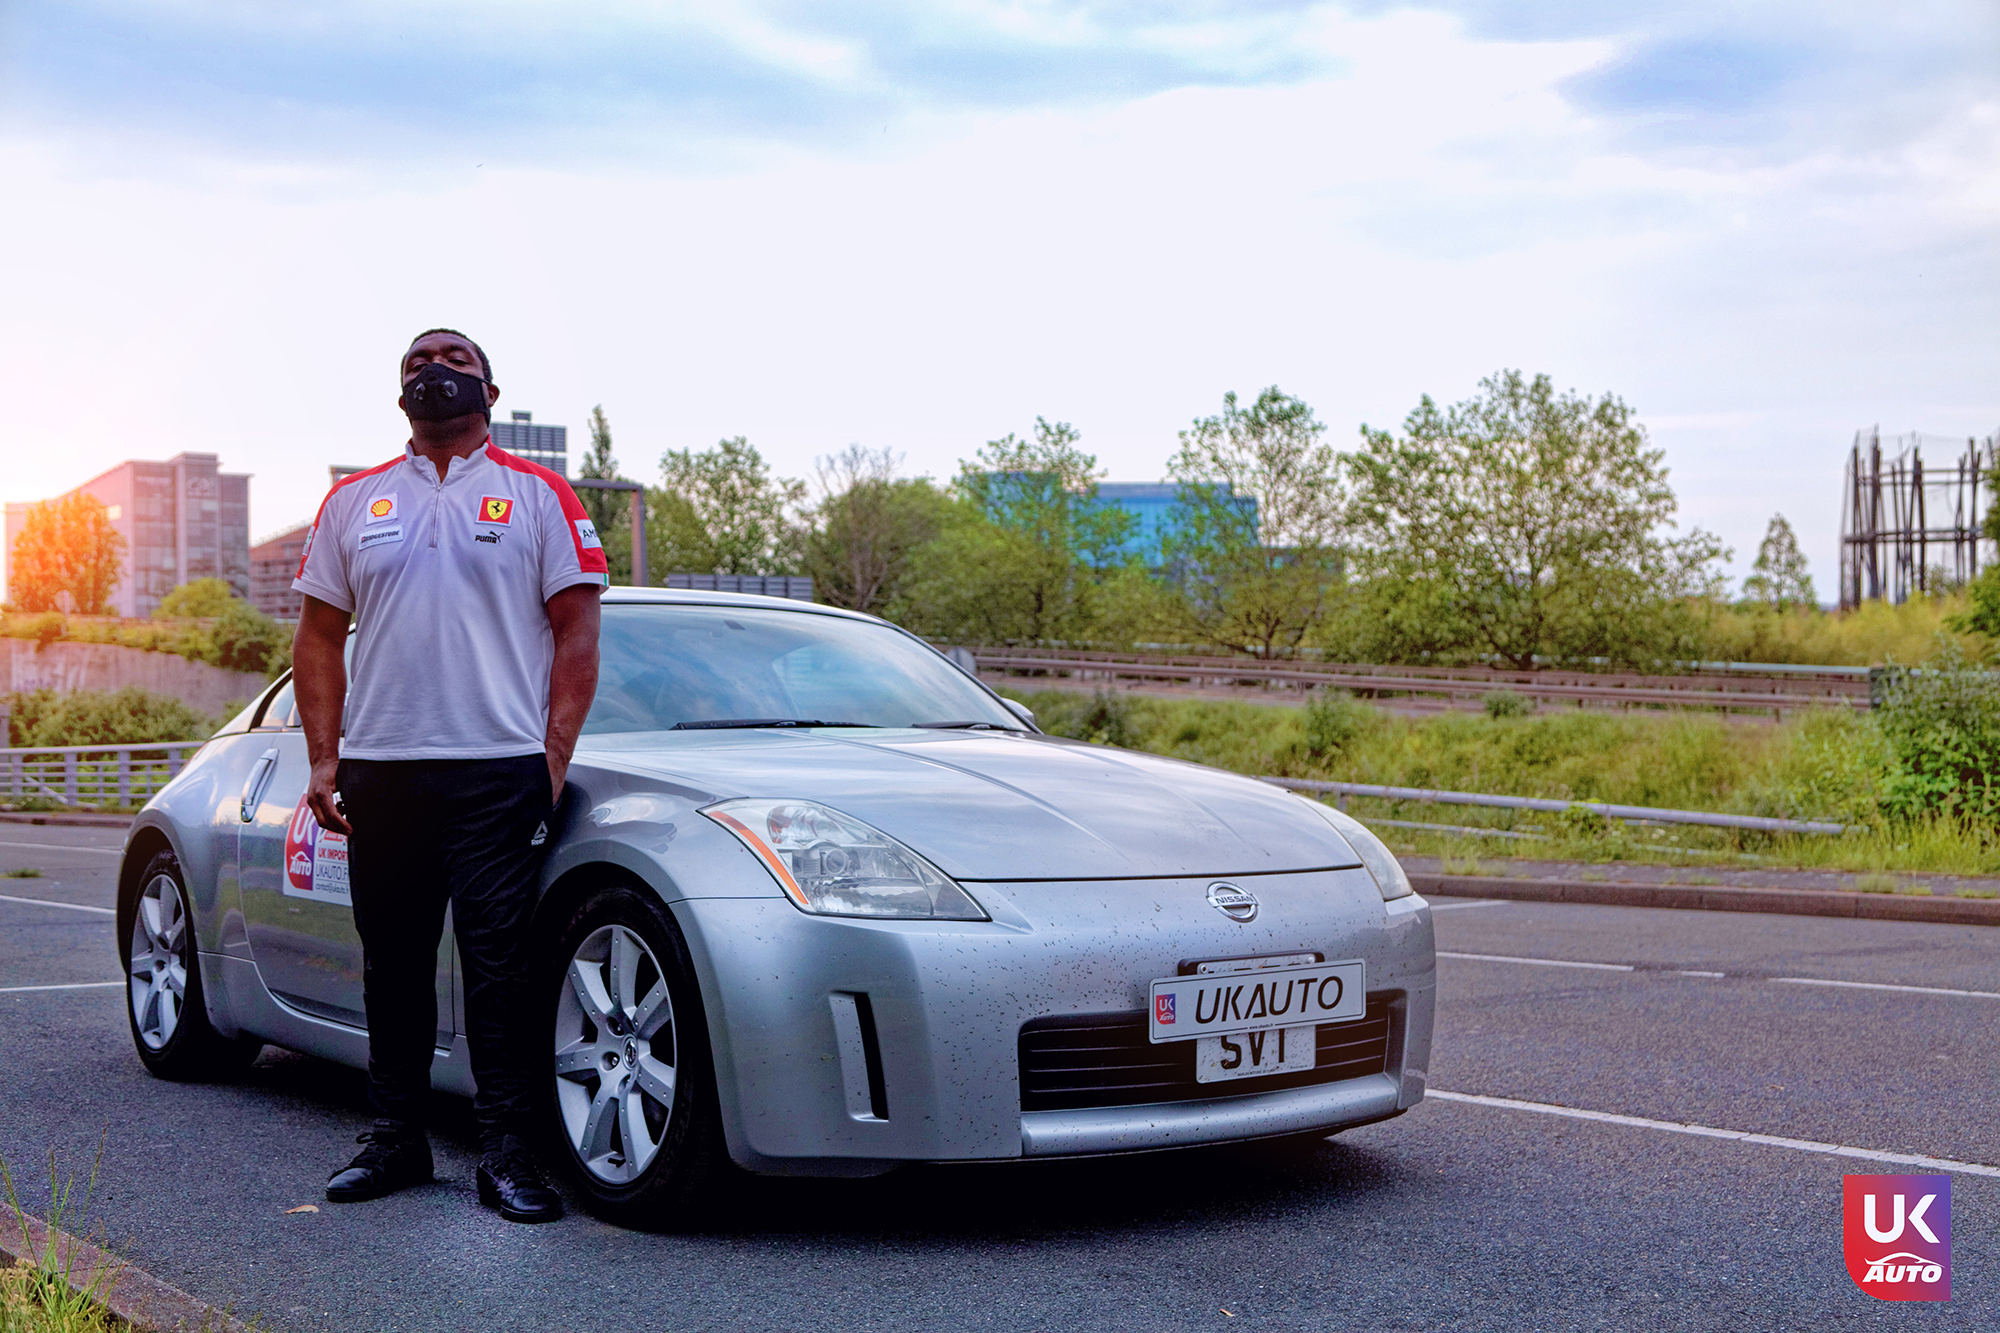 Ukauto import nissan 350z jdm import fairlady v6 import uk ukauto rhd nissan import uk12 - Import Nissan 350Z JDM IMPORT 3.5 V6 TIPTRONIC IMPORT AUTO par UKAUTO